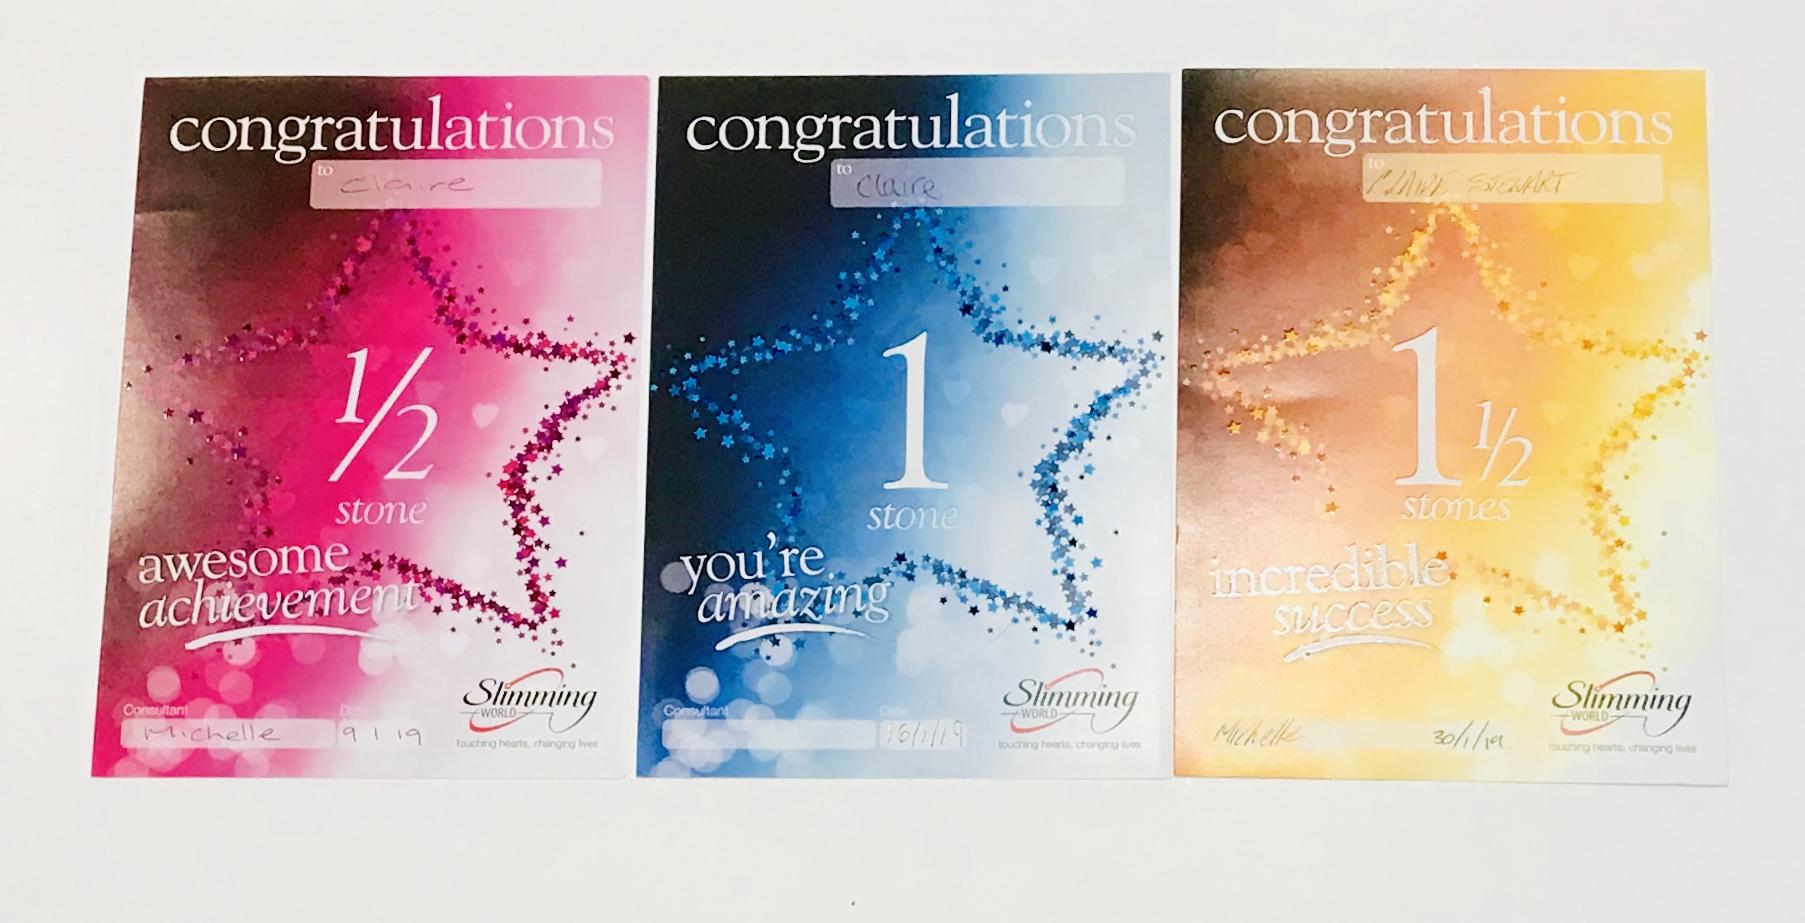 slimming world certificates